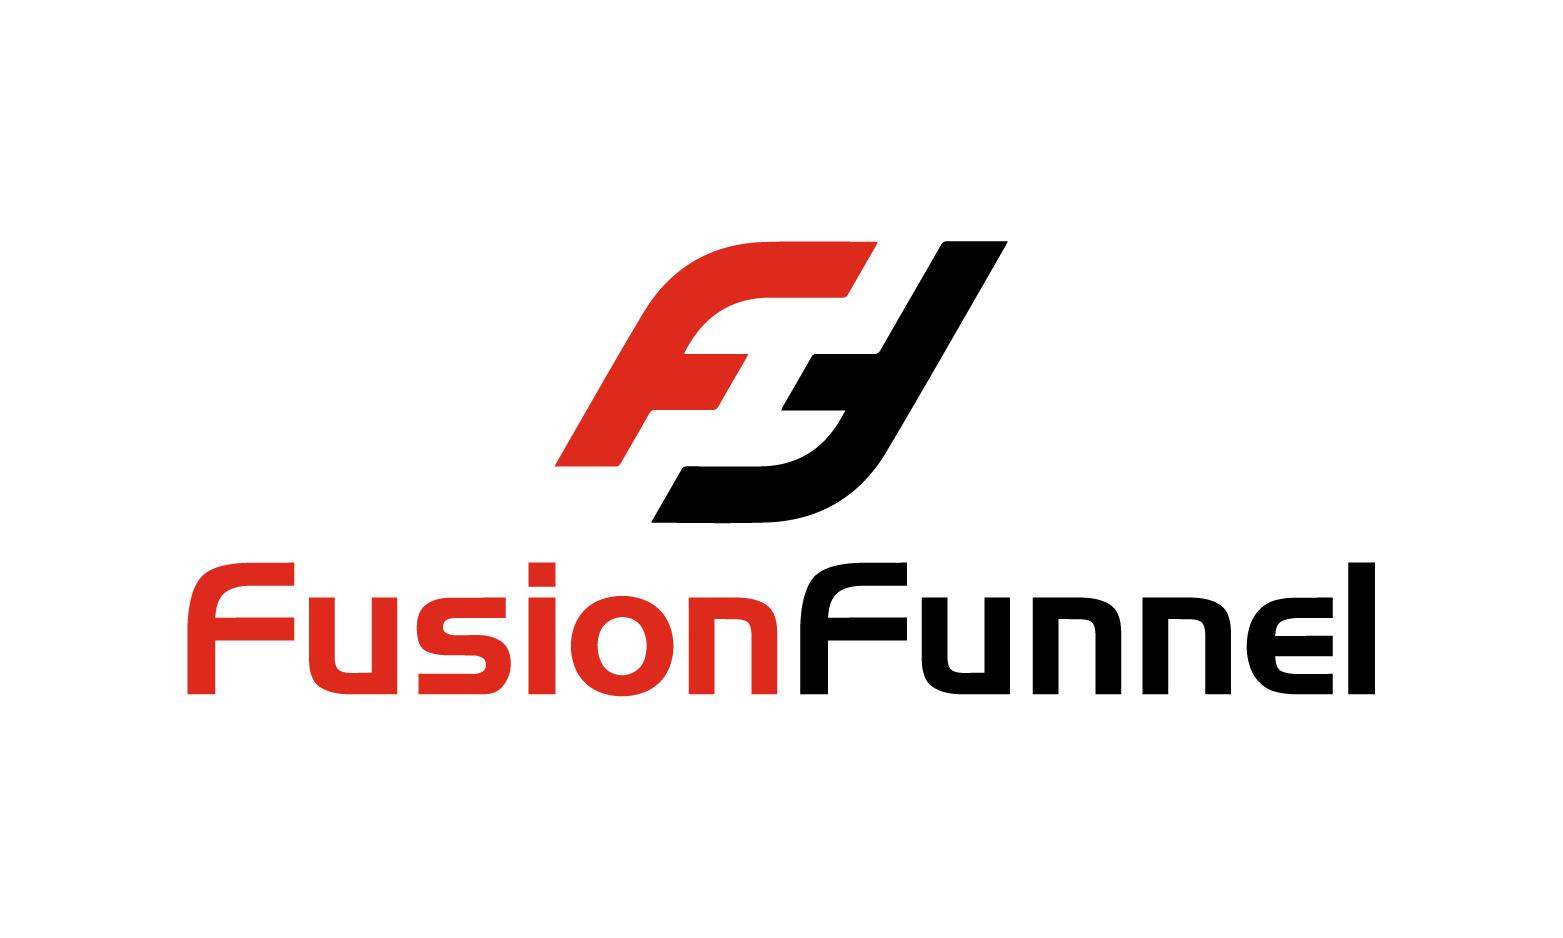 FusionFunnel.com